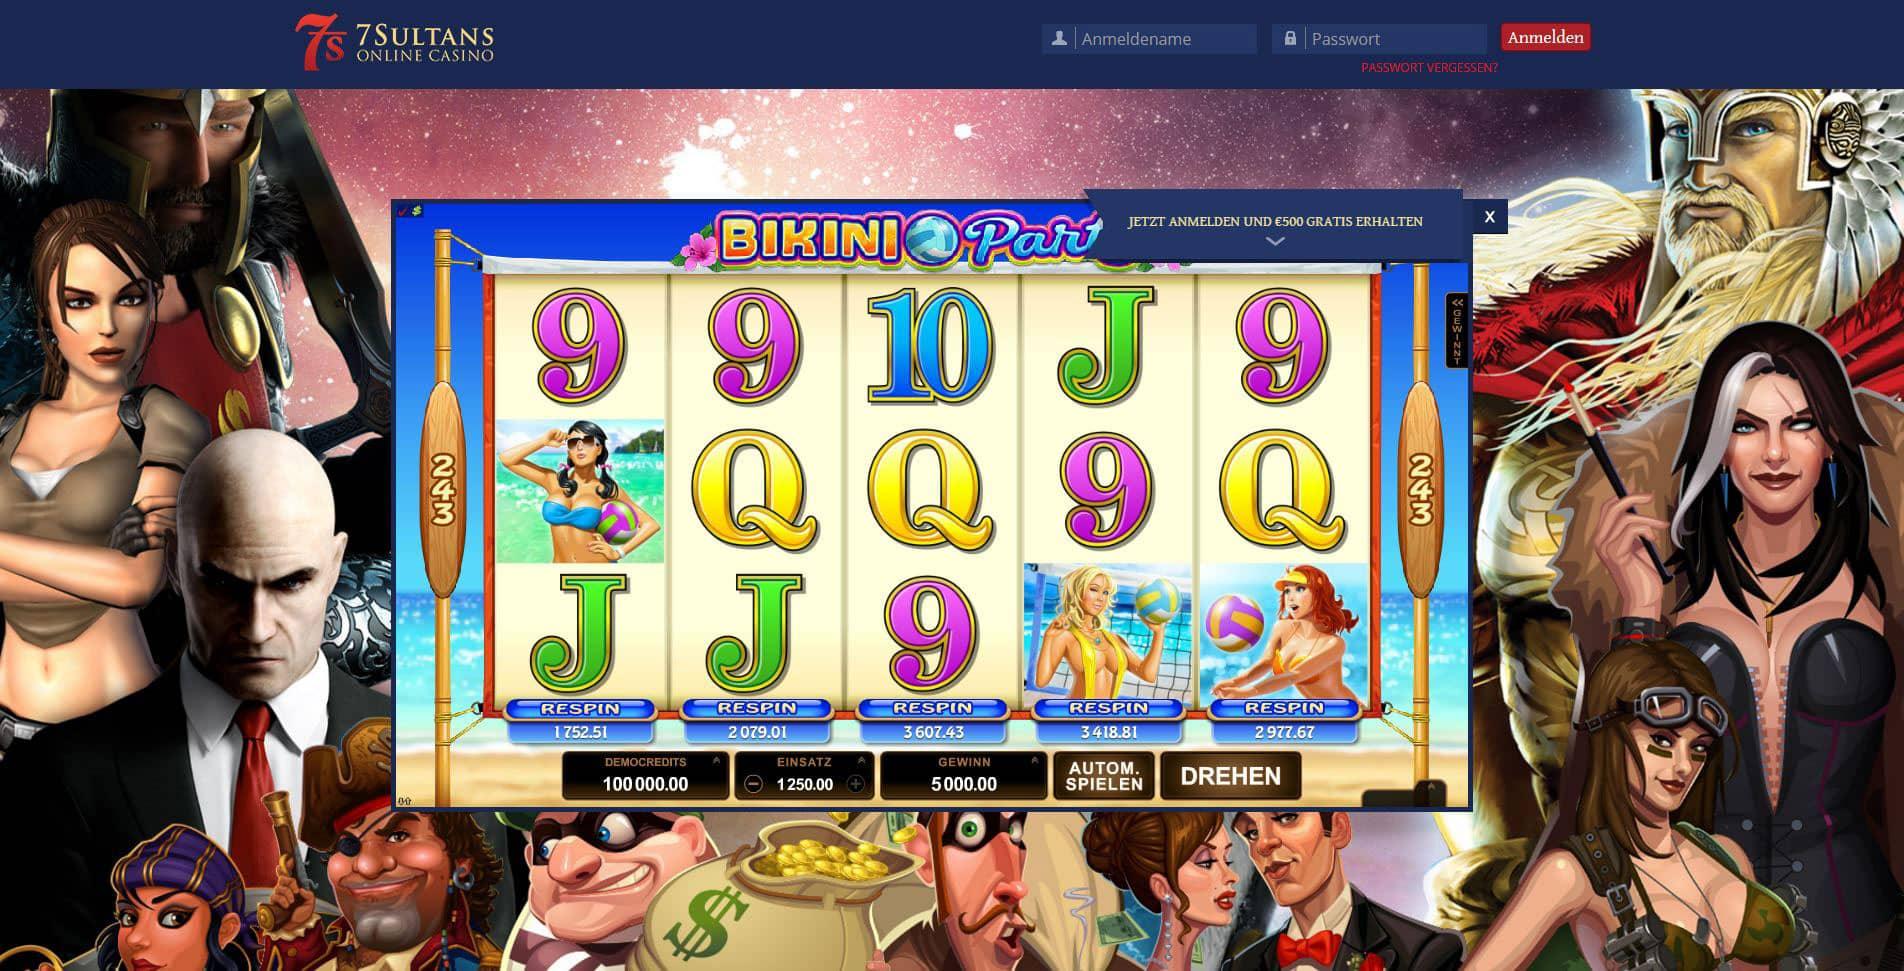 Instant Banking | bis 400 € Bonus | Casino.com Deutschland